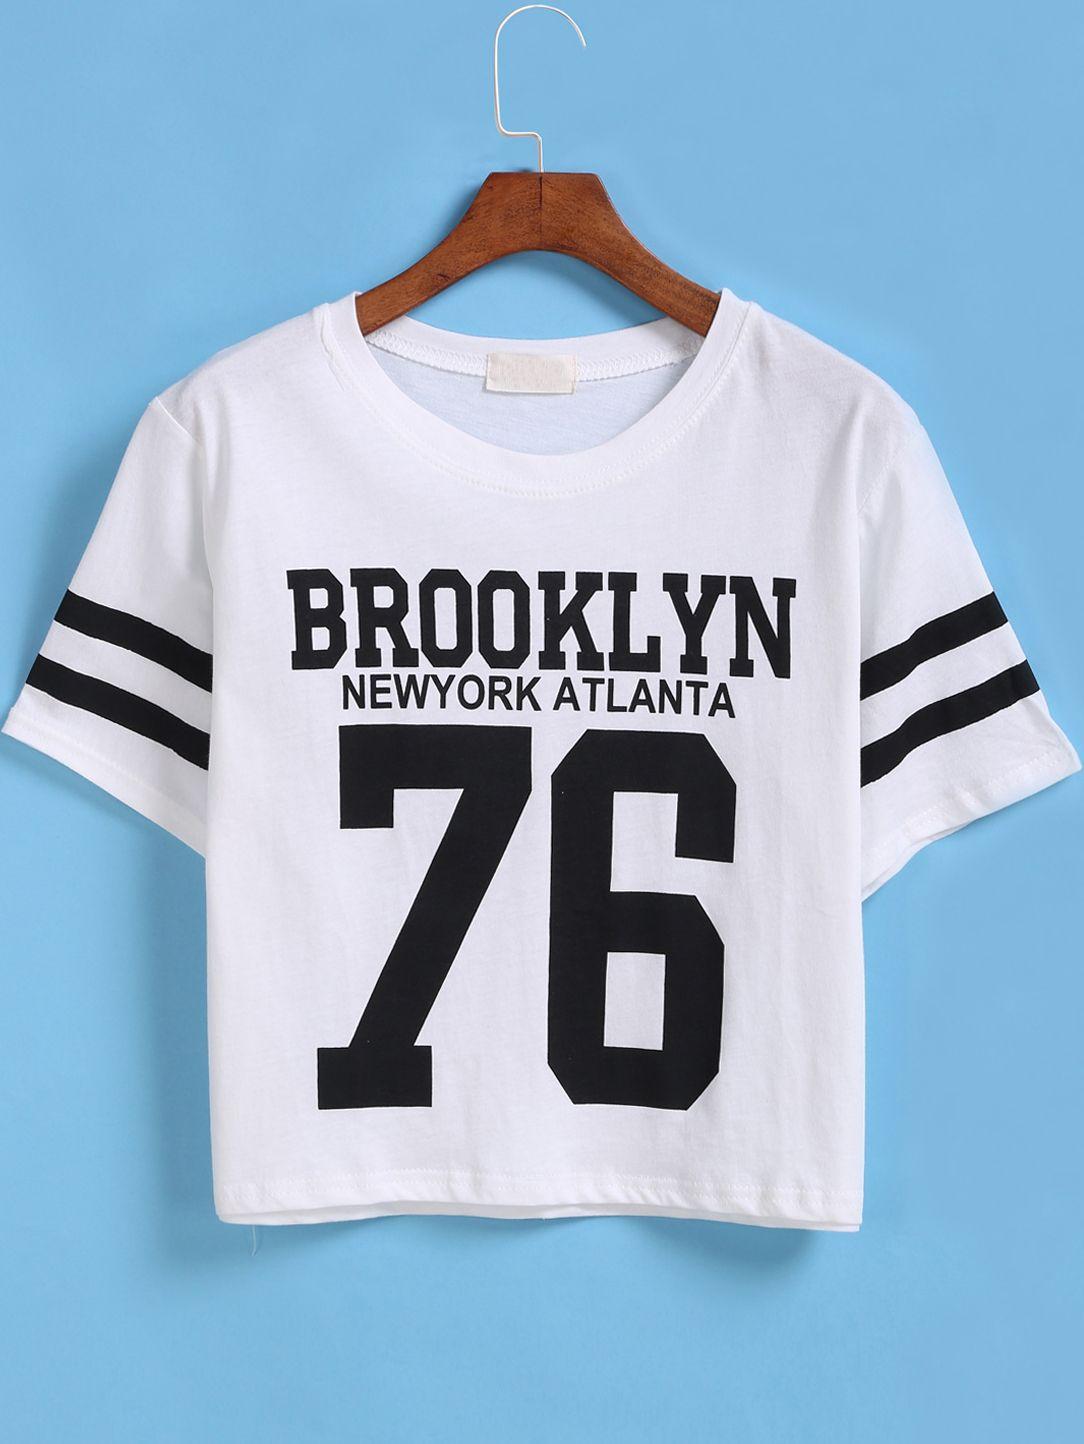 White Short Sleeve BROOKLYN 76 Print Number Comfort Racewear Monogrammed Crop T-Shirt -SheIn(Sheinside)